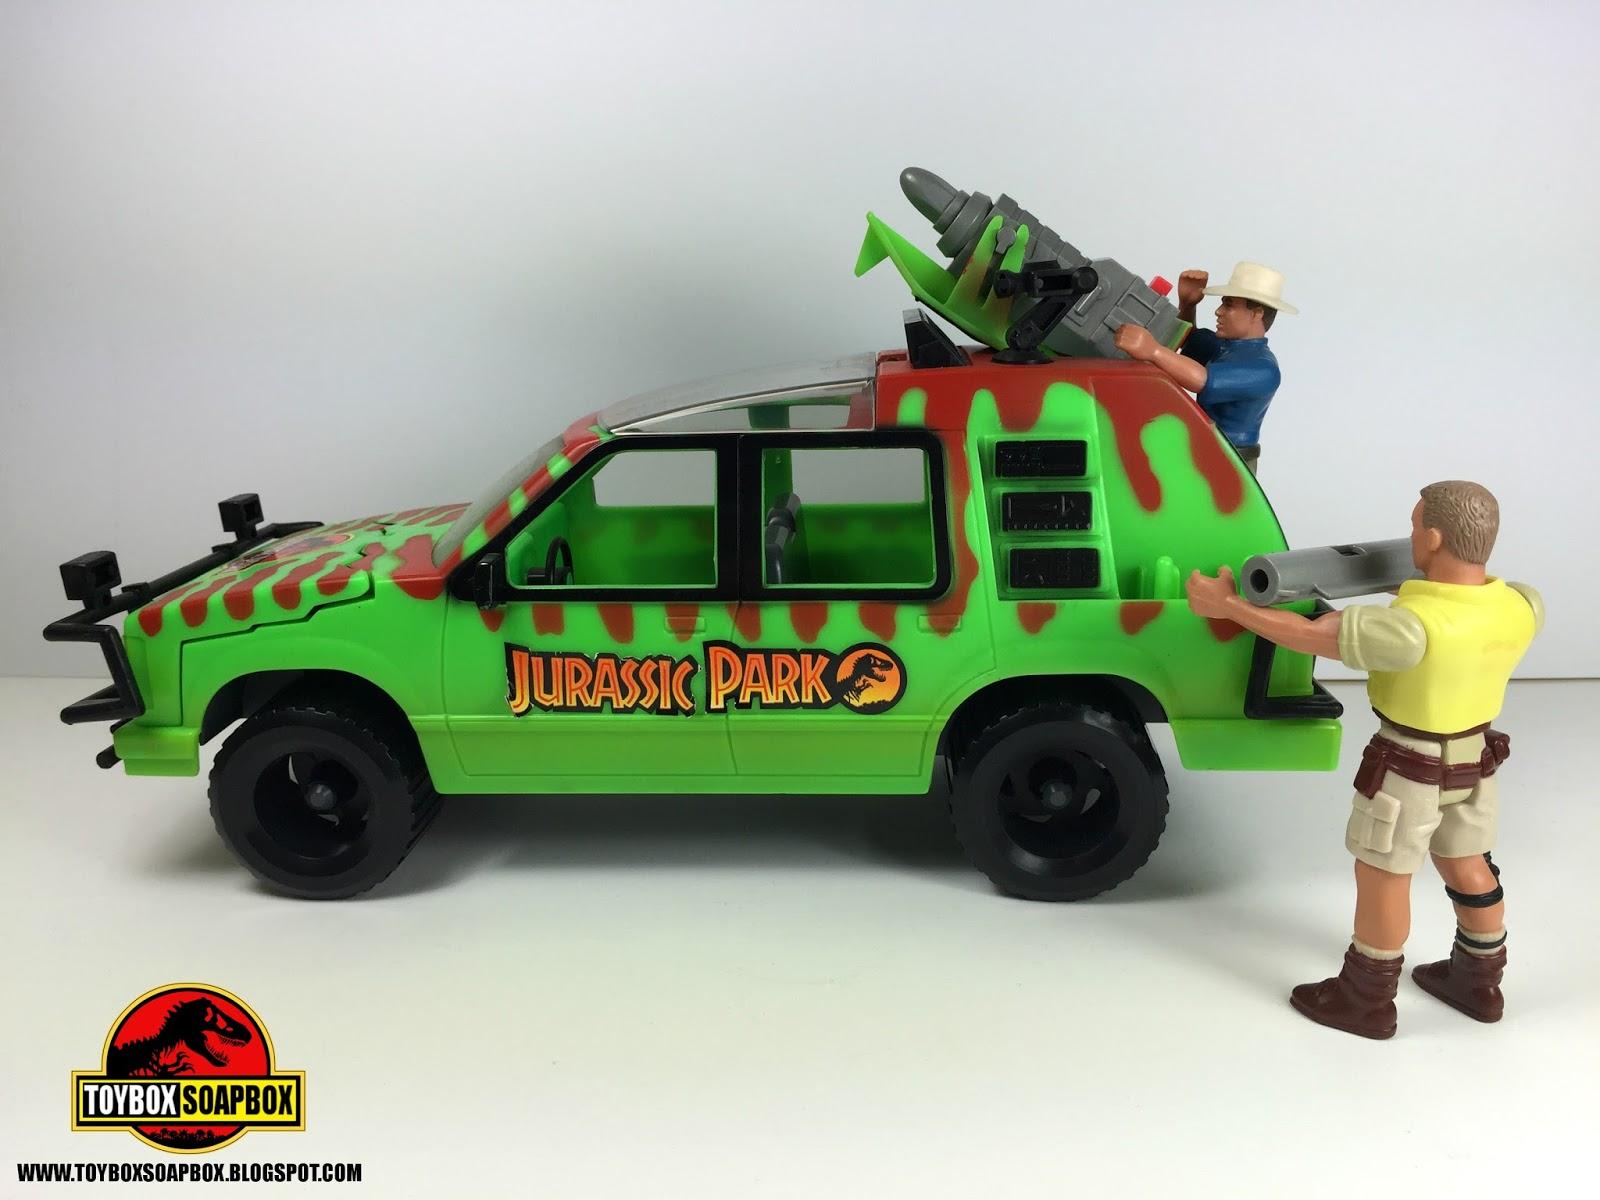 Jurassic Park Toys : Toybox soapbox past plastic kenner jurassic park